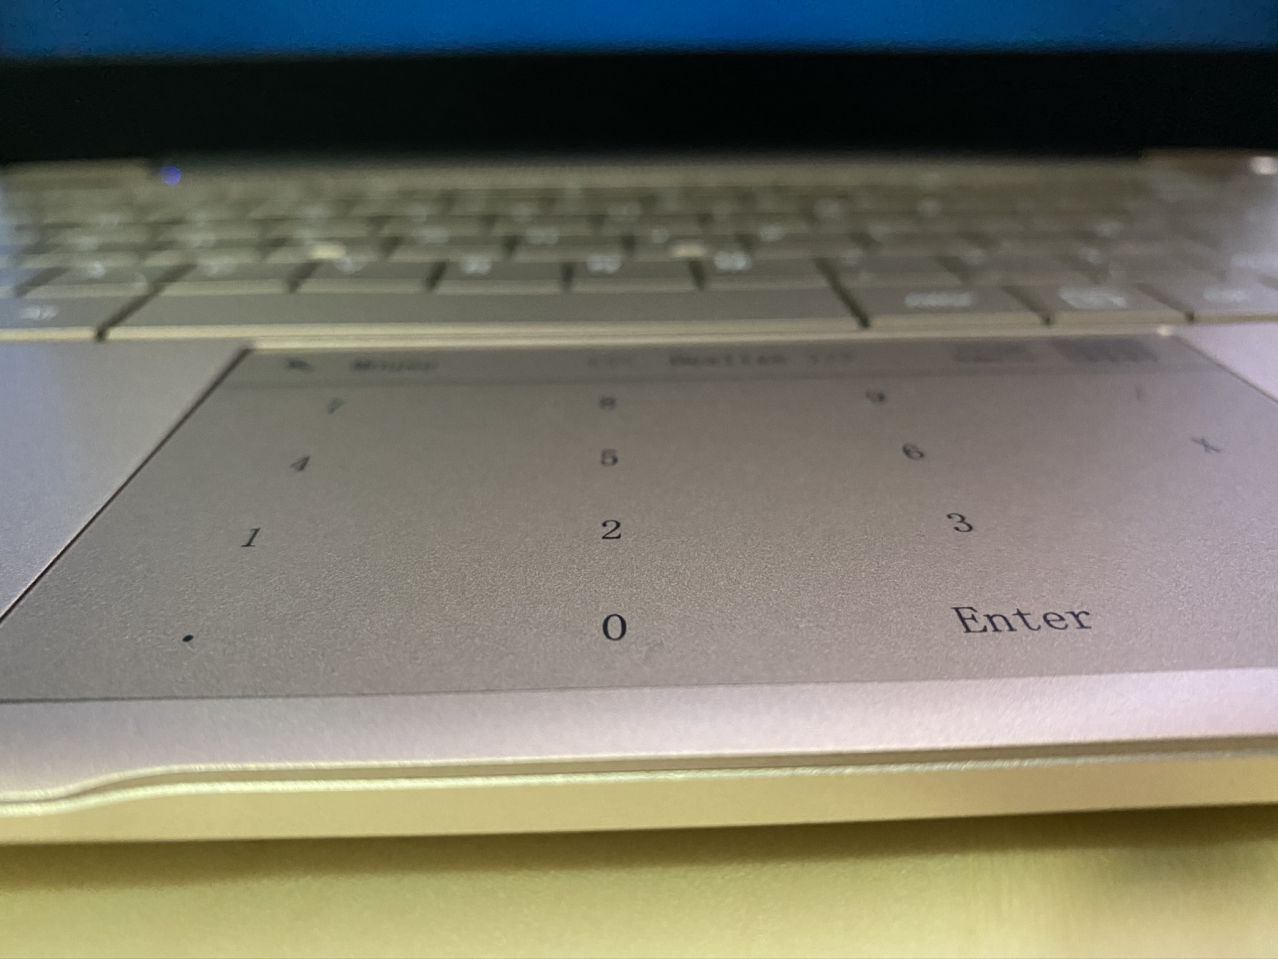 recensione-kuu-k2-4 Recensione KUU K2: Ultrabook Cinese 2020